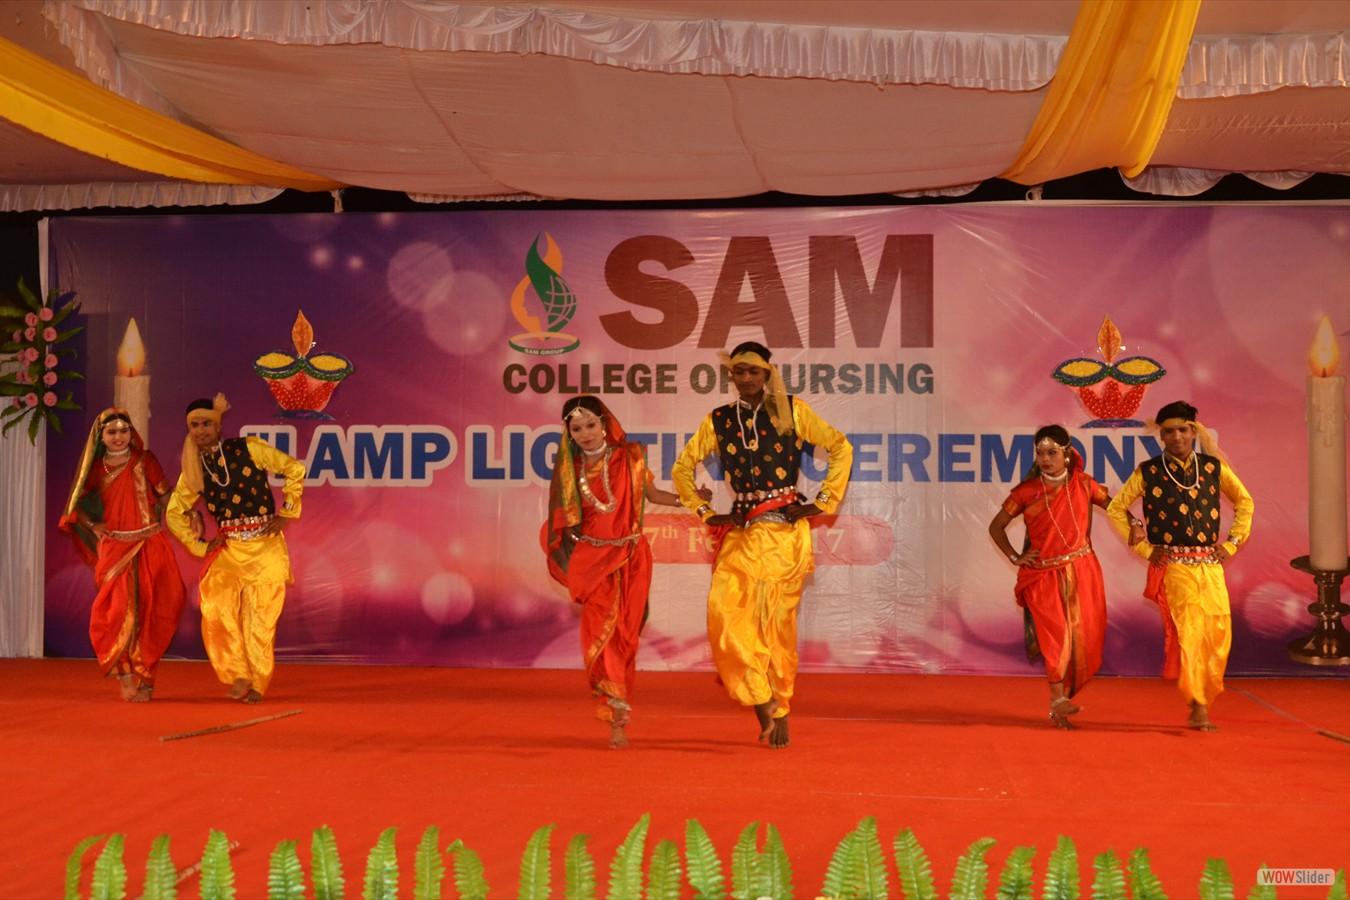 Sam College Of Nursing Image